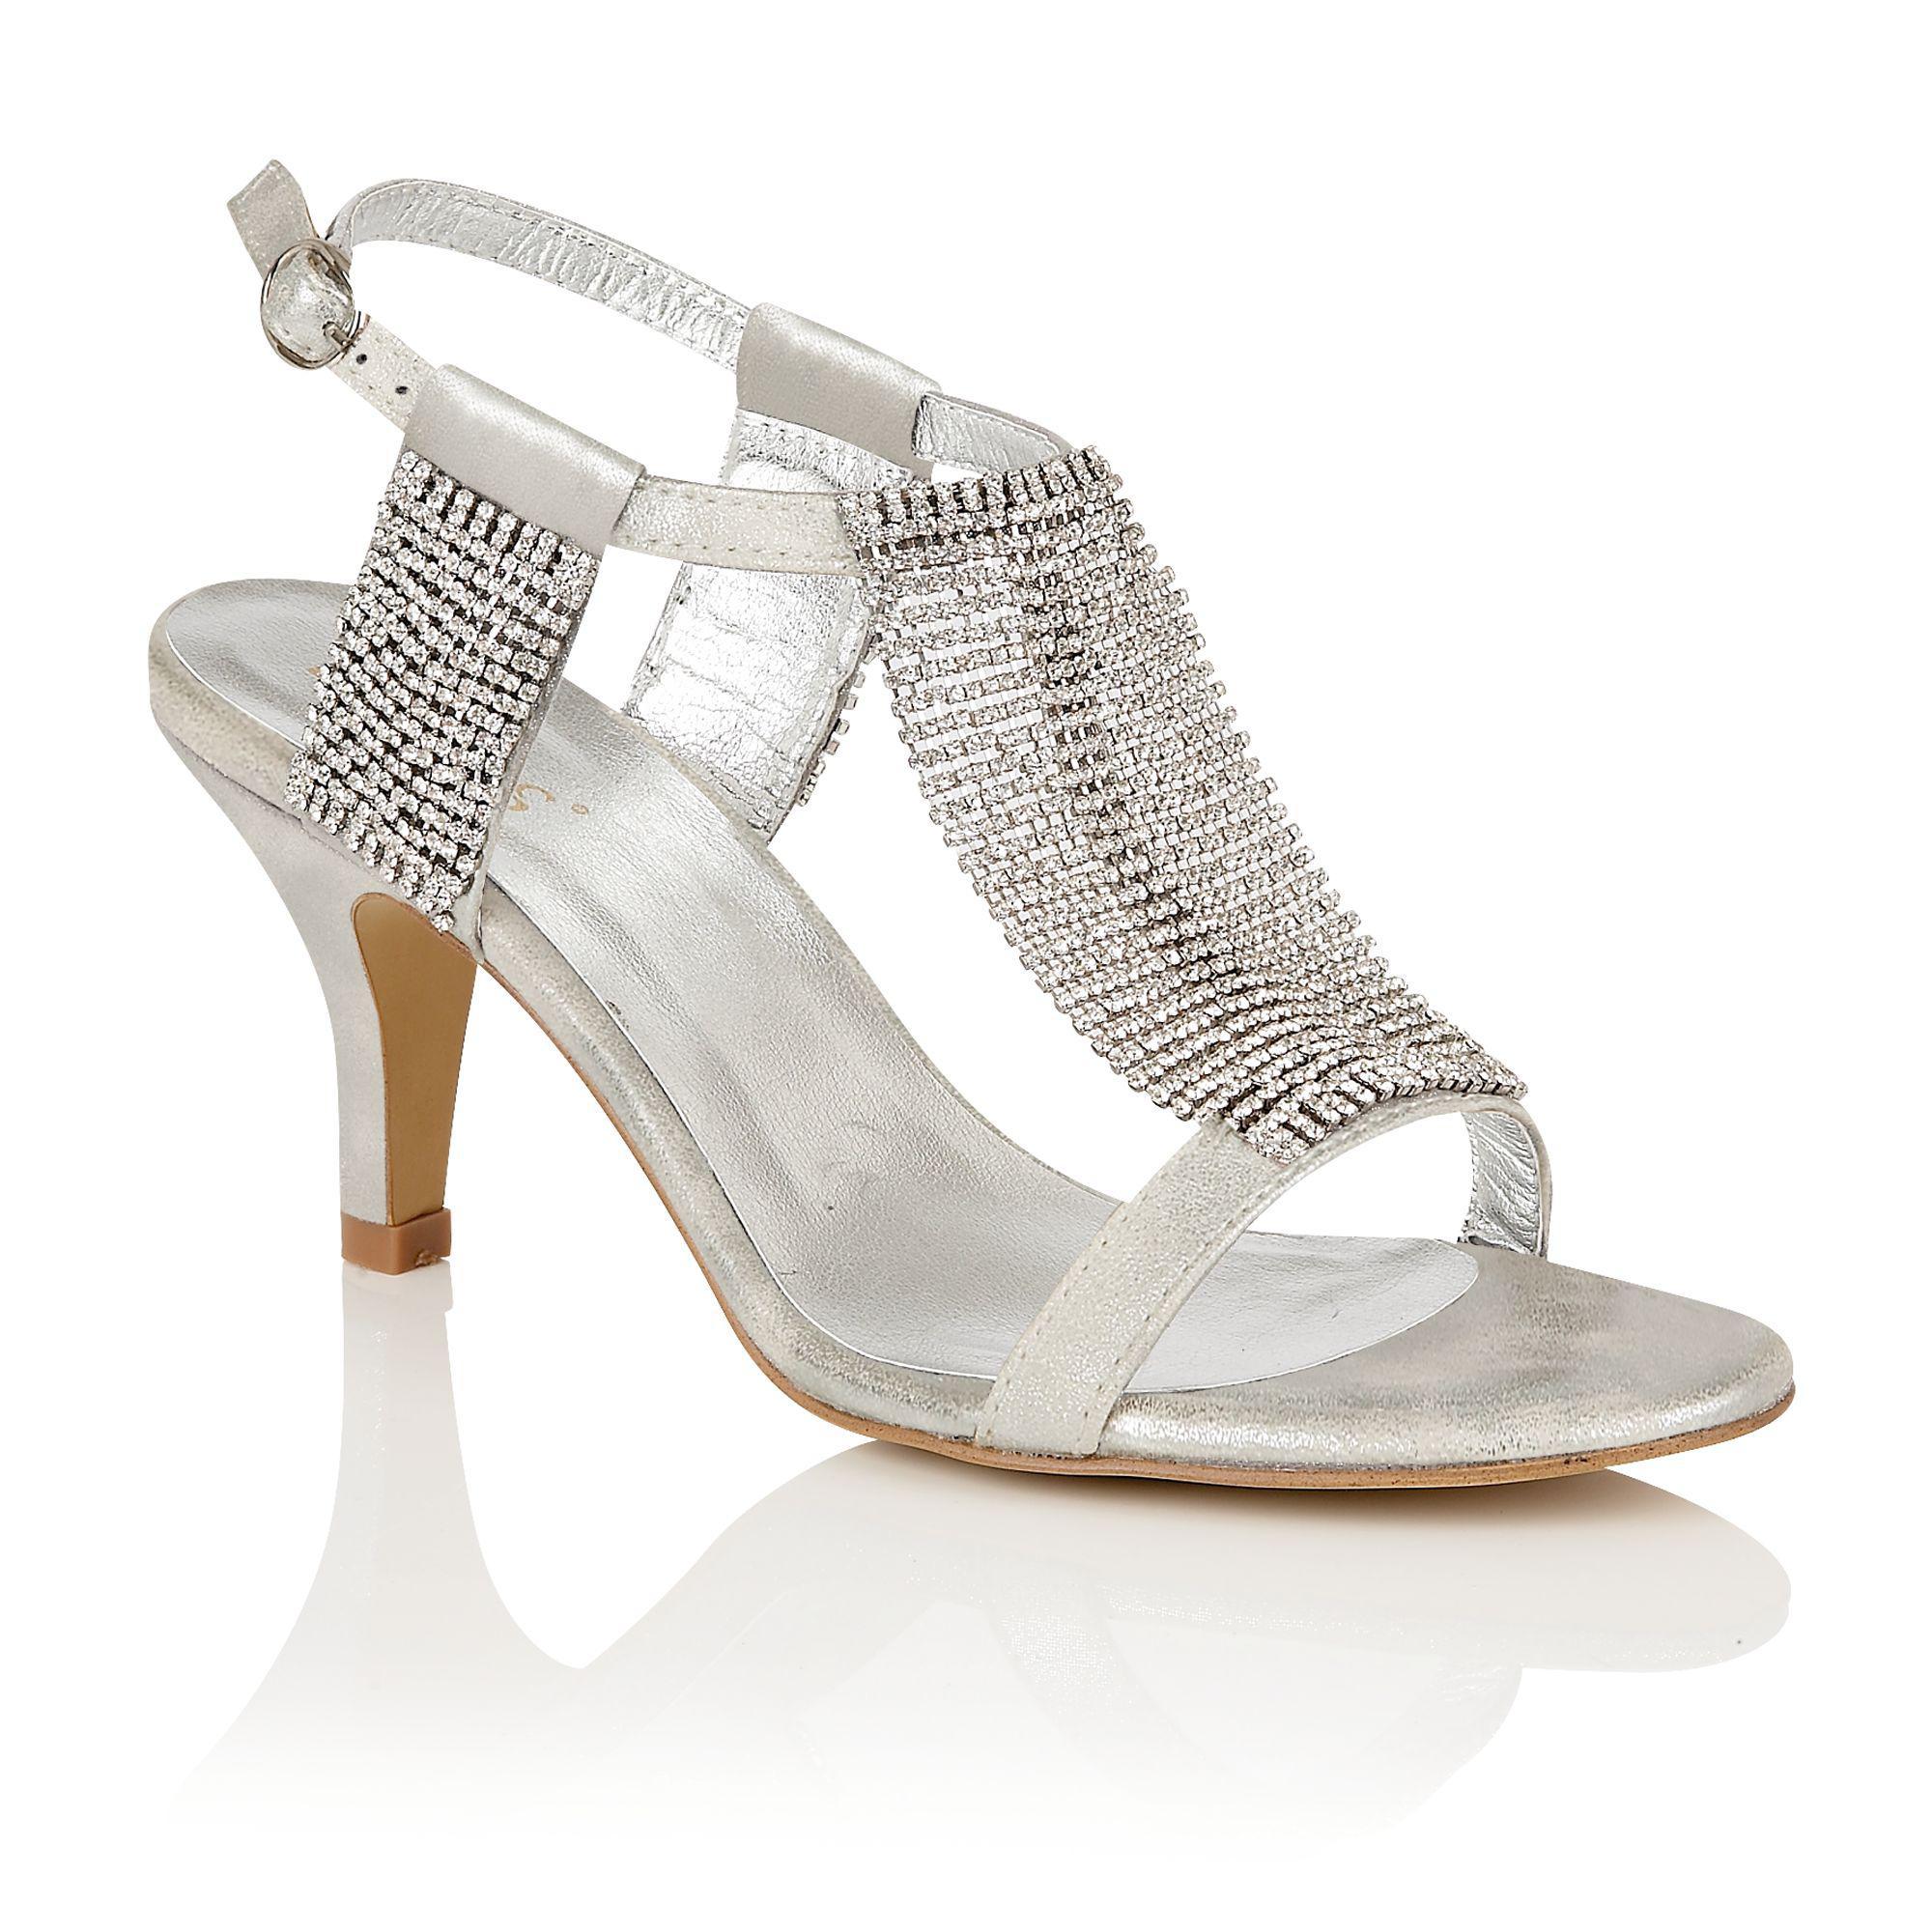 c839d4dbe97e Lotus Silver Diamante  aspey  High Heel T-bar Sandals in Metallic - Lyst